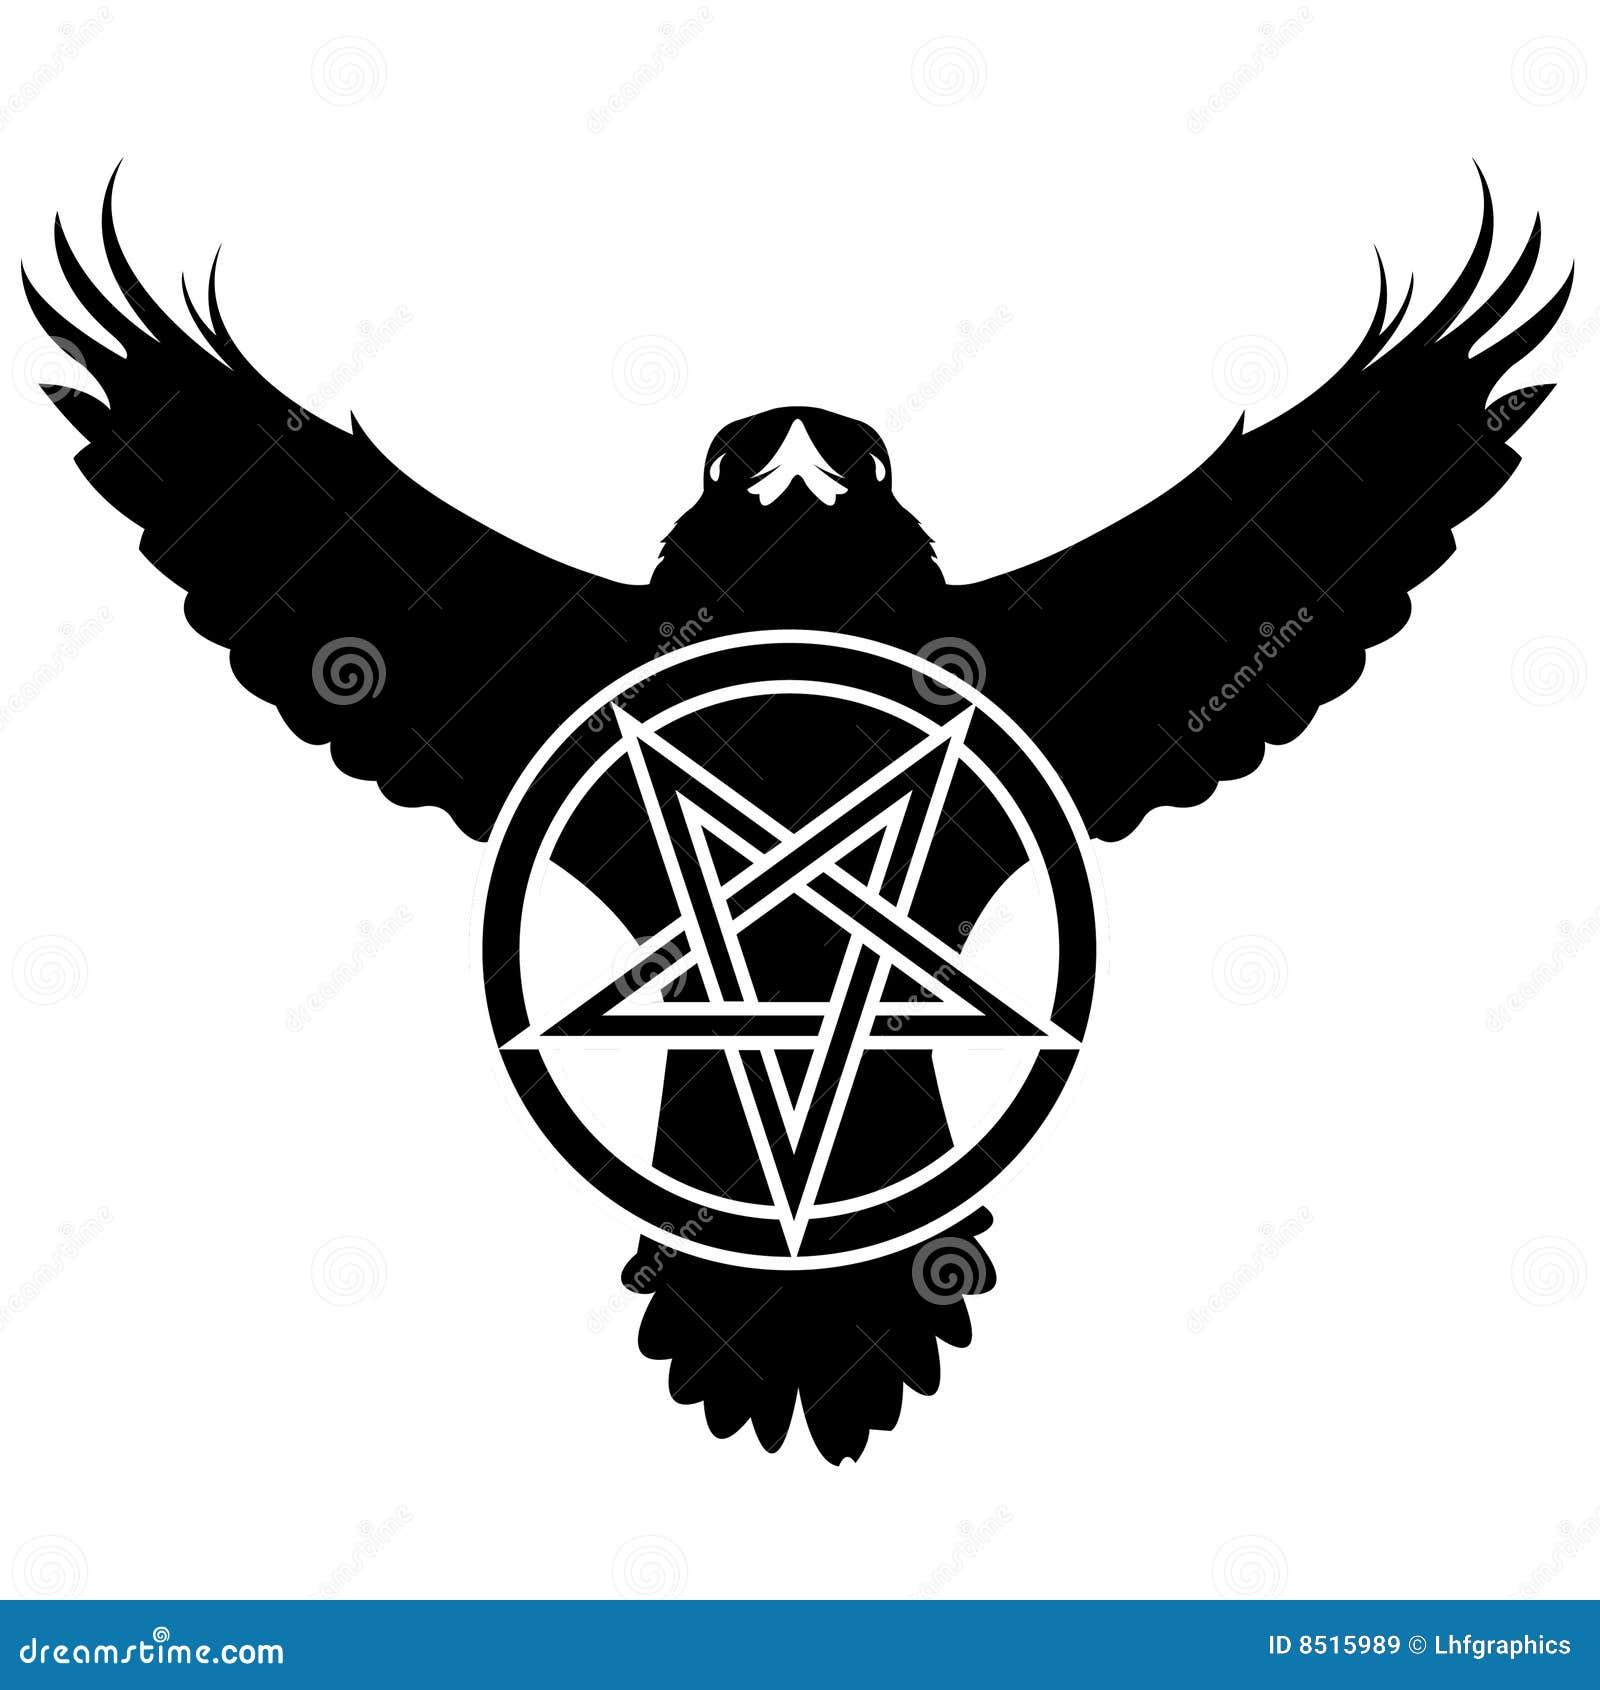 Grunge raven with pentagram